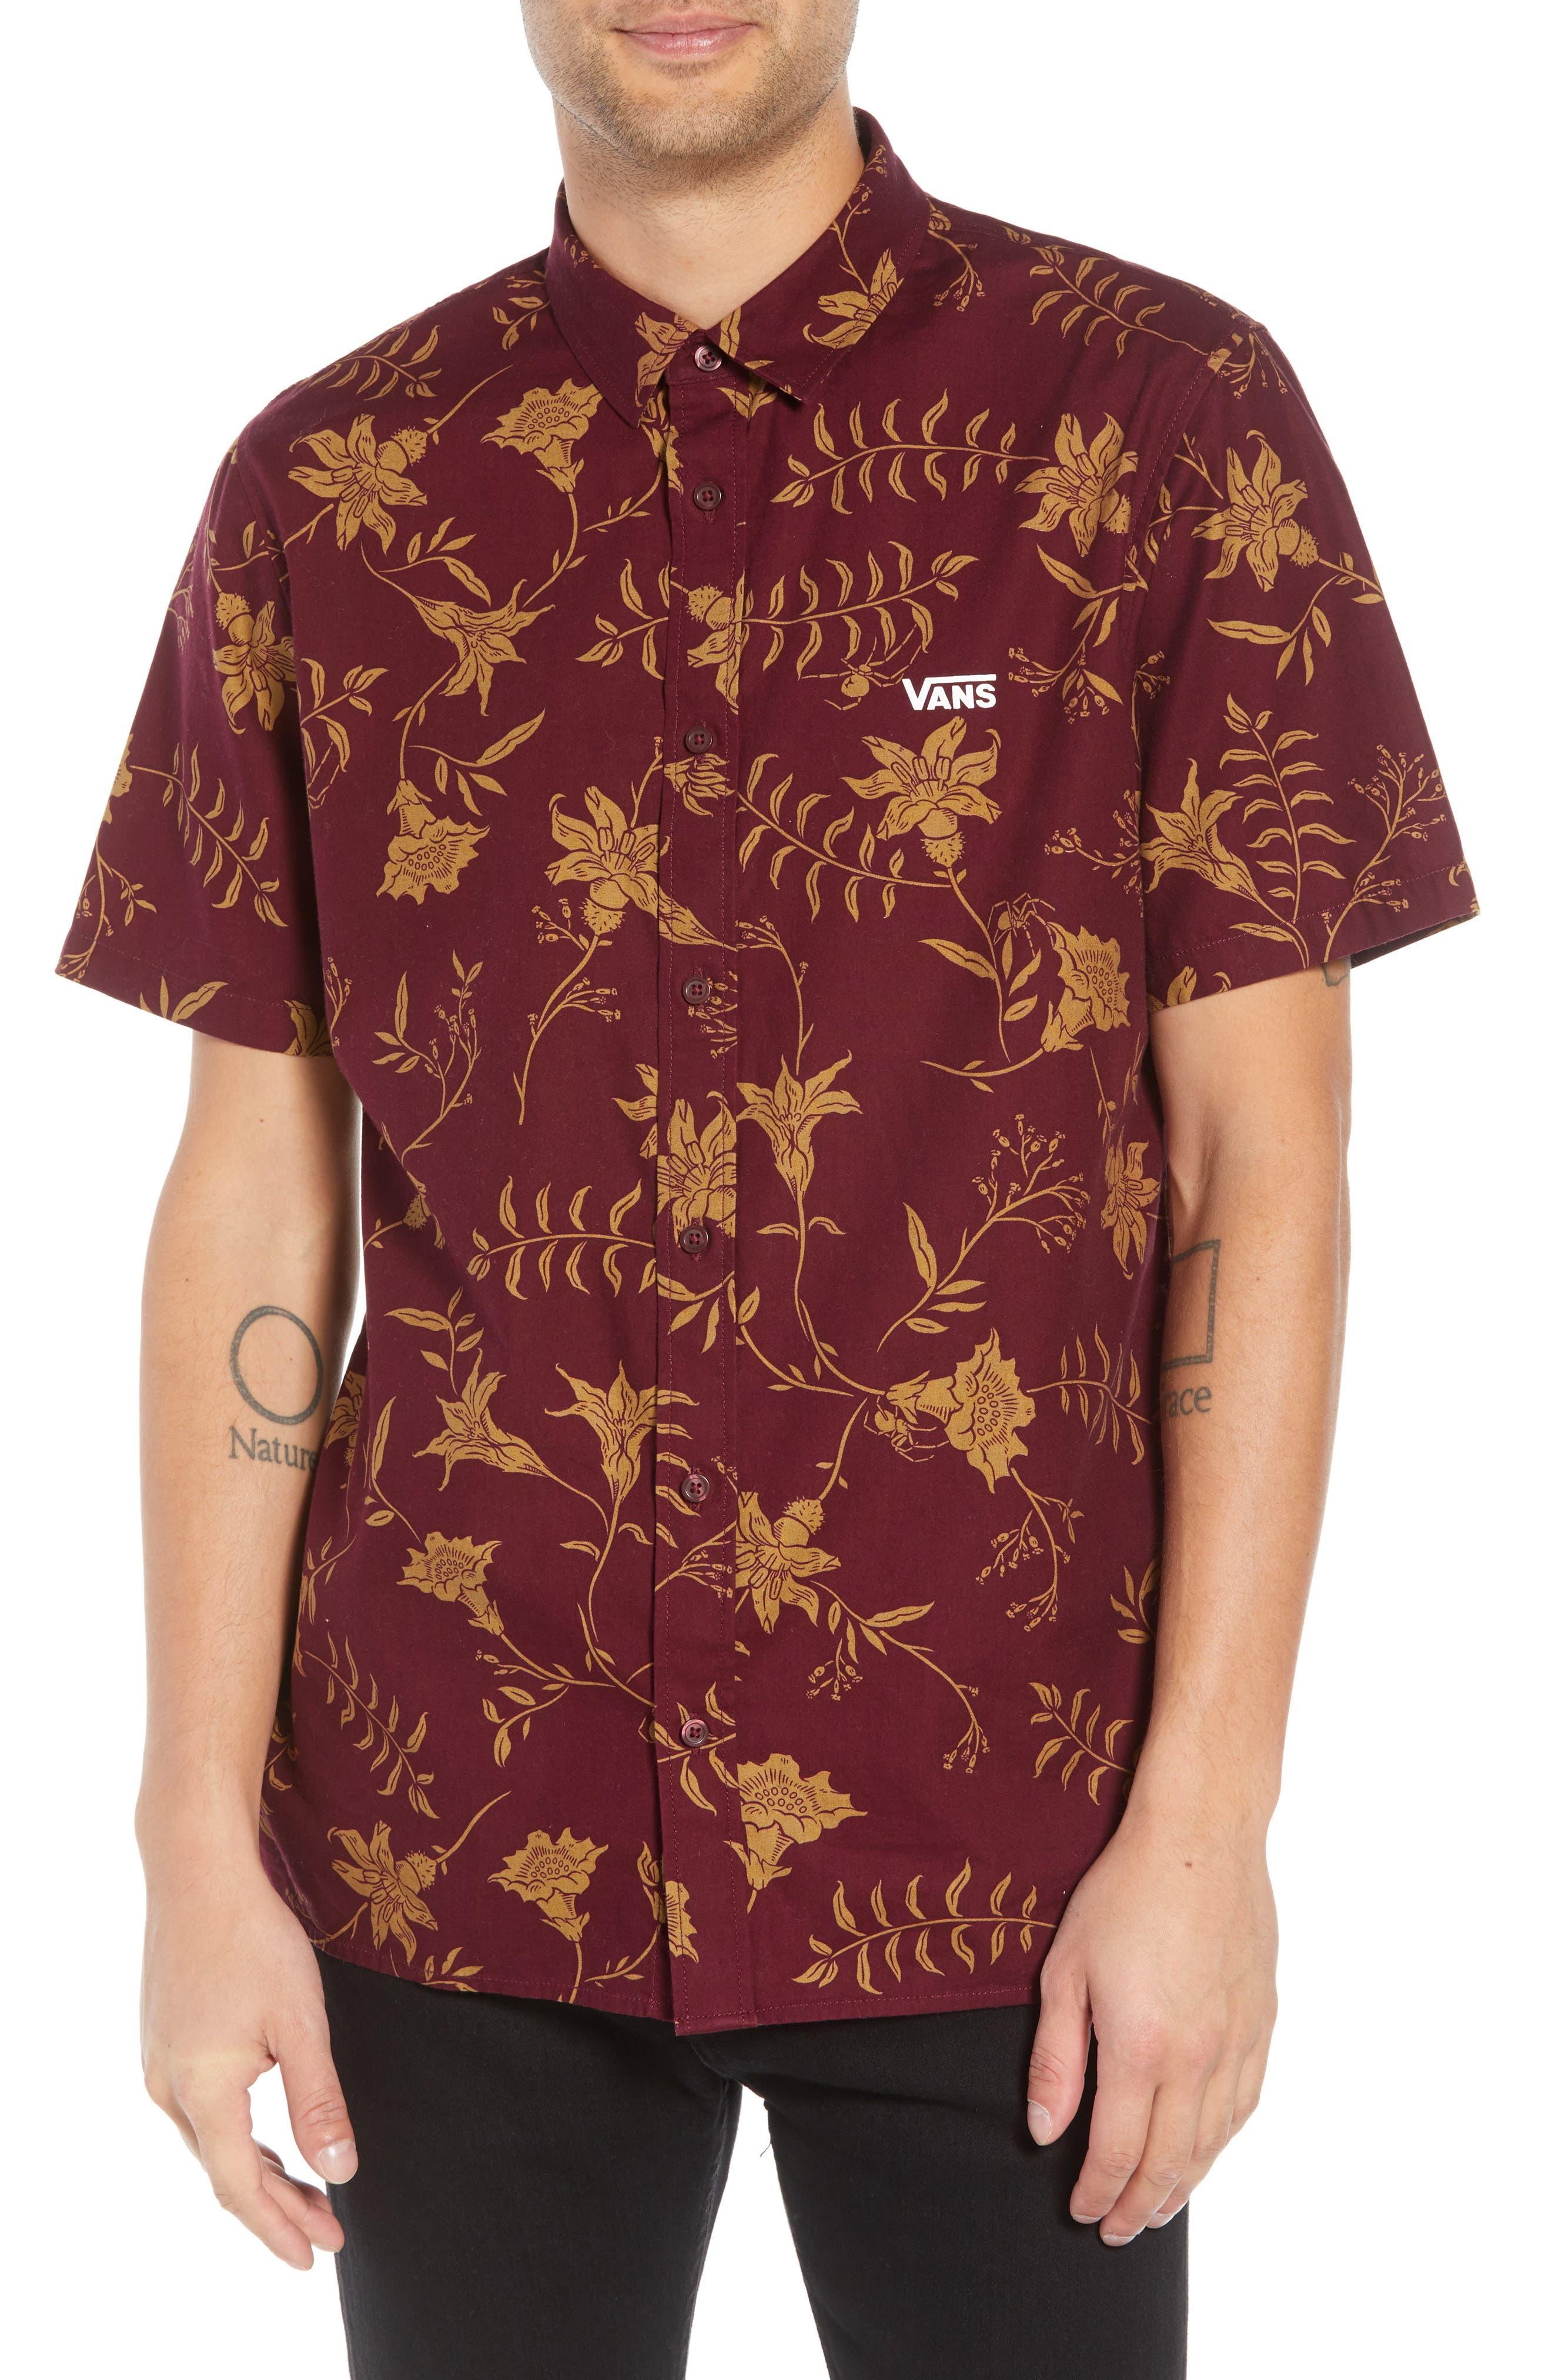 9bfd8828973 Vans plants floral print woven shirt in port modesens jpg 780x1196 Floral  vans shirt